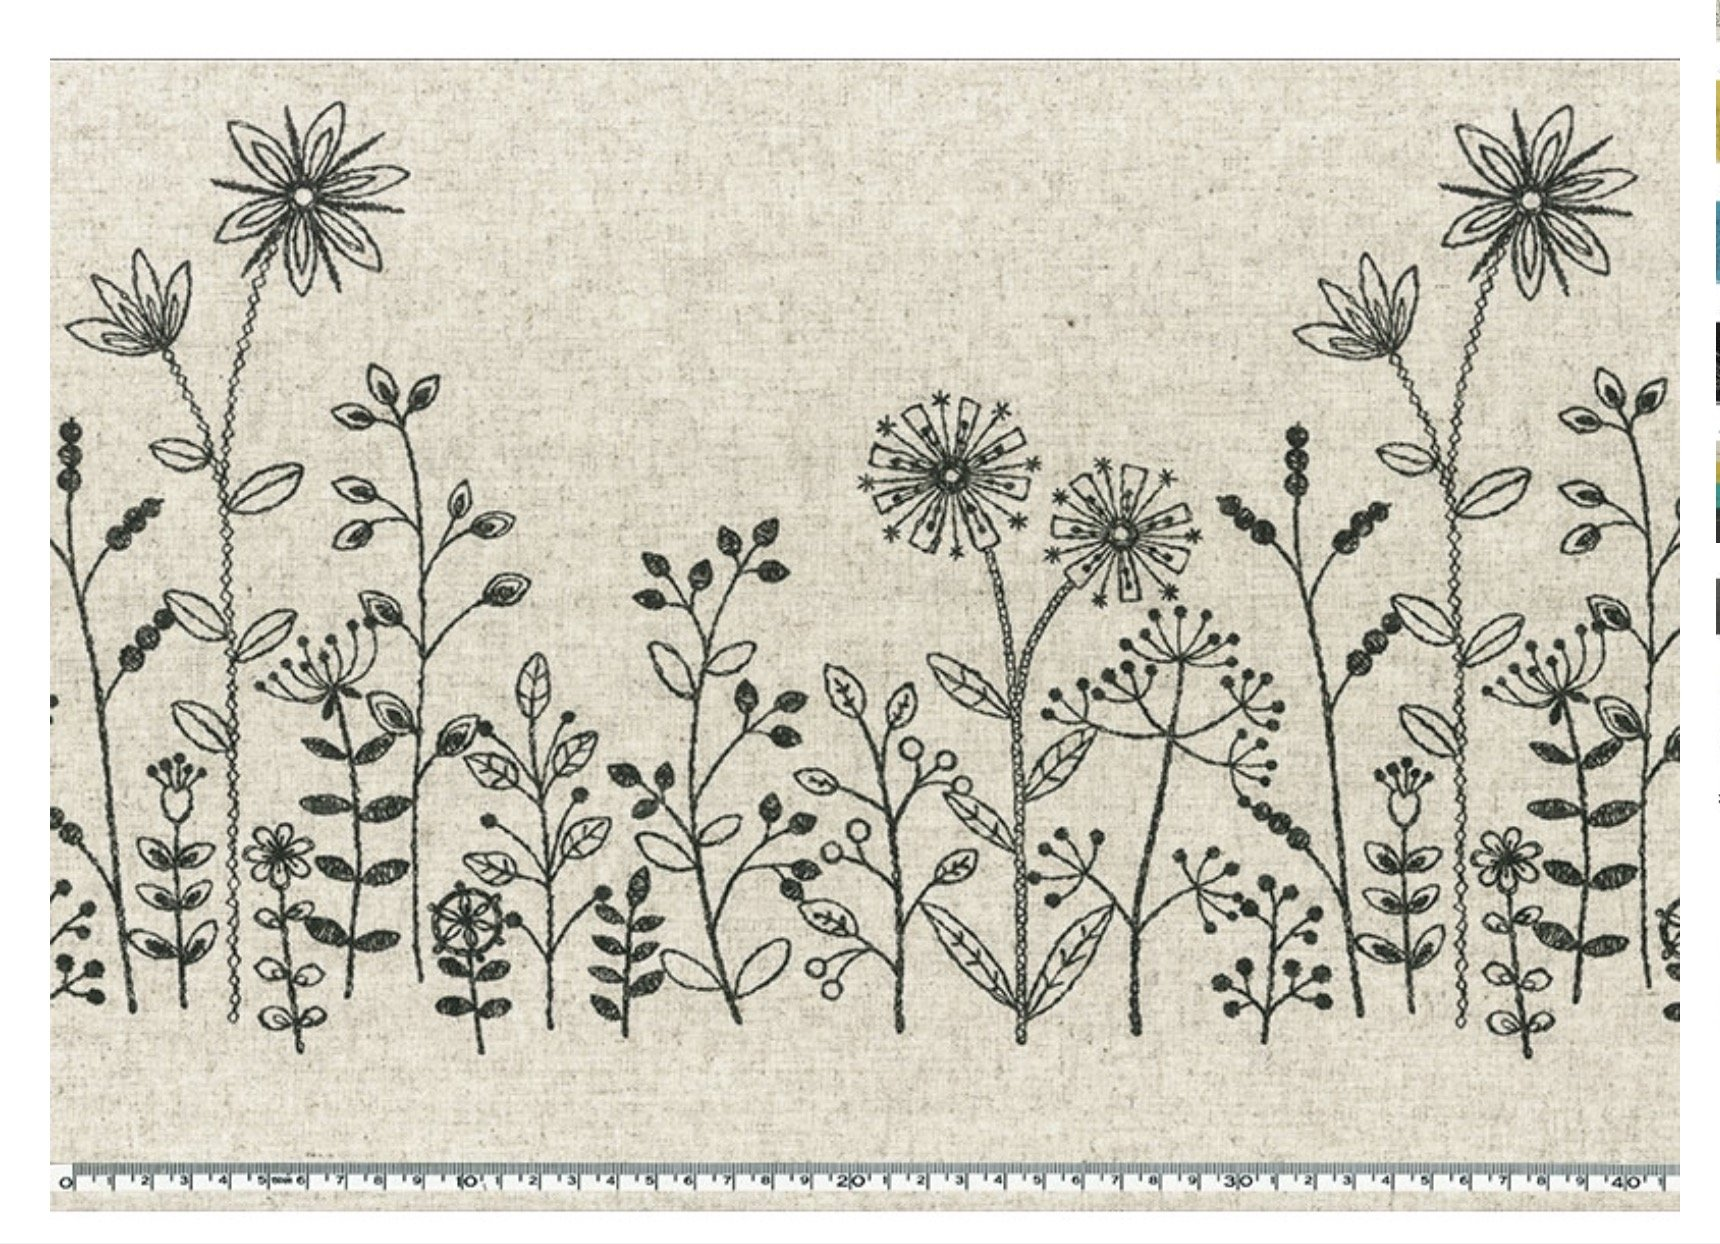 Yoko Saito Collection - Embroidery Border Print - Etoffe Imprevue 2017